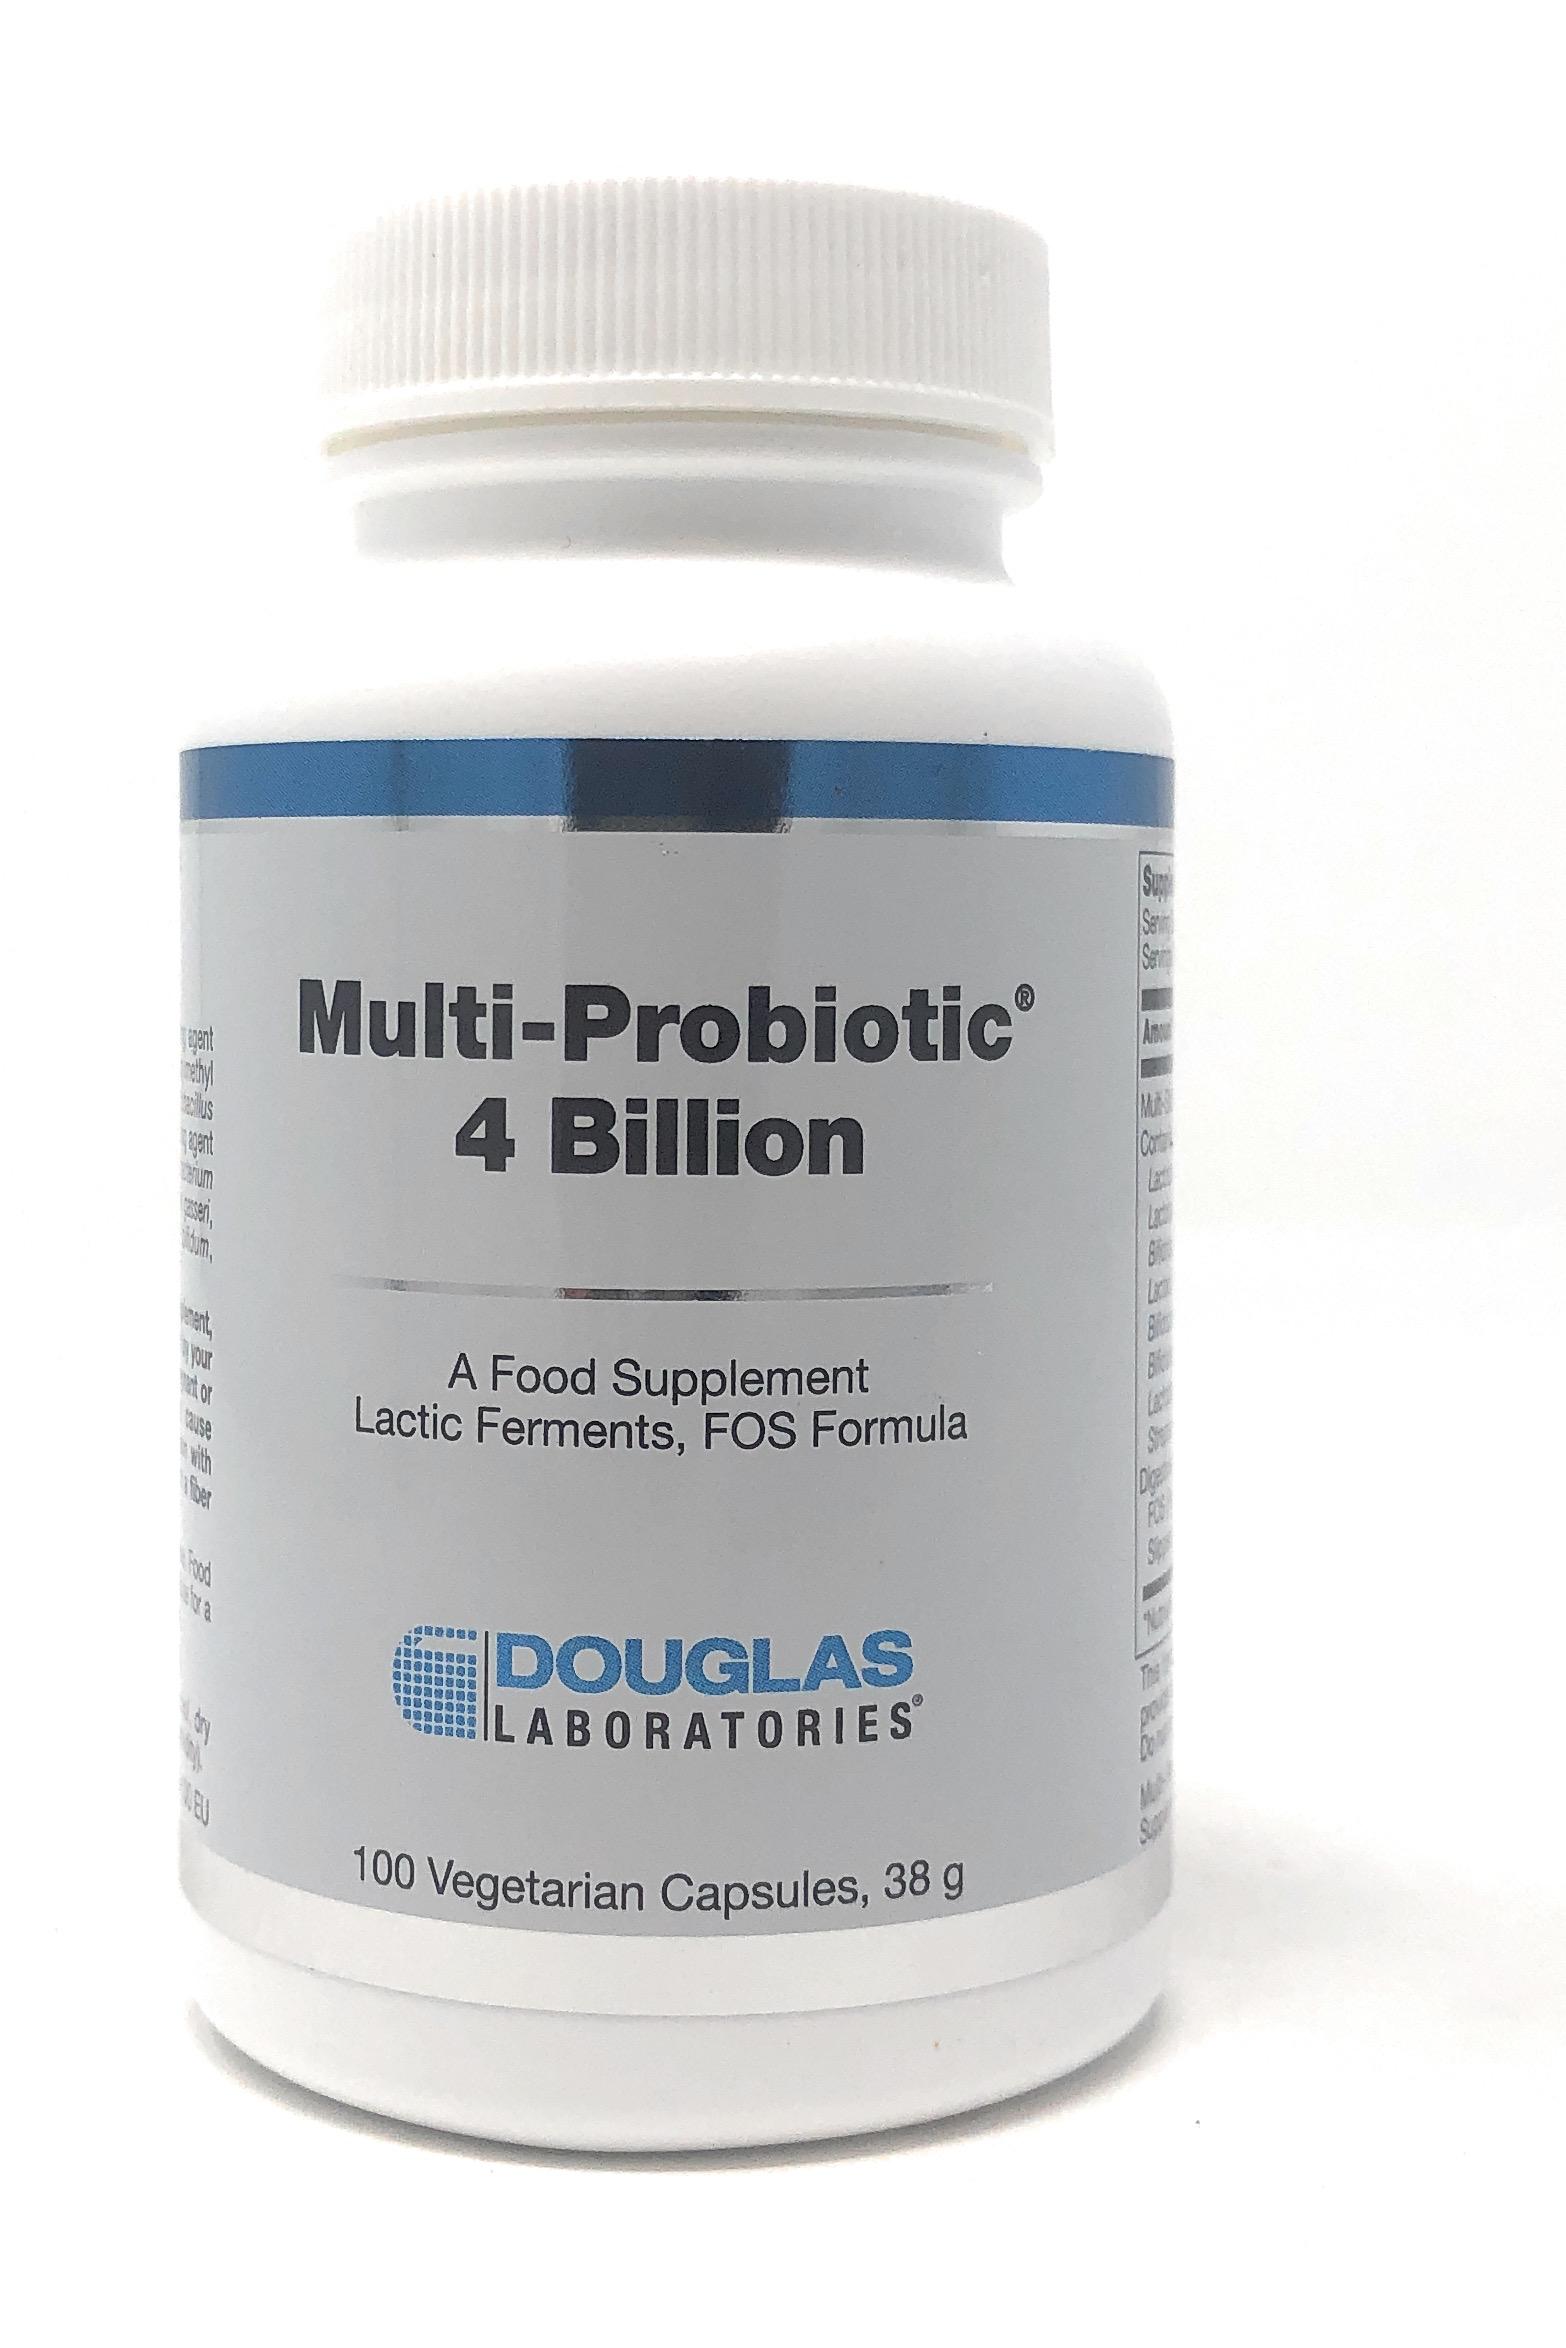 Douglas Laboratories Europe Multi-Probiotic 4 Billion 100 veg. Kapseln (38g)